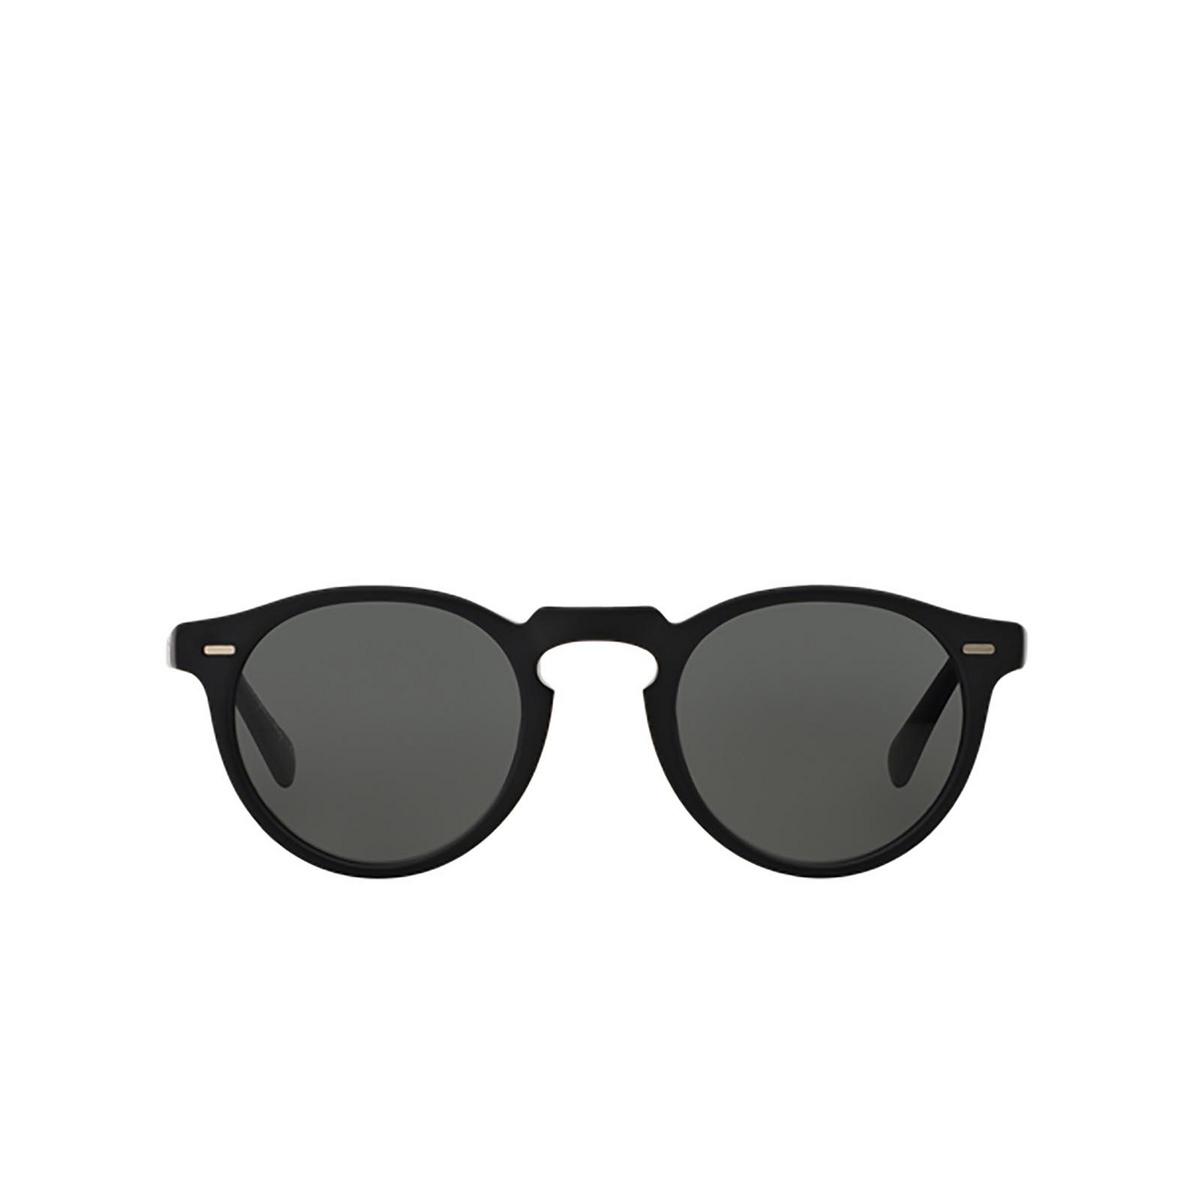 Oliver Peoples® Round Sunglasses: Gregory Peck Sun OV5217S color Semi Matte Black 1031P2 - front view.